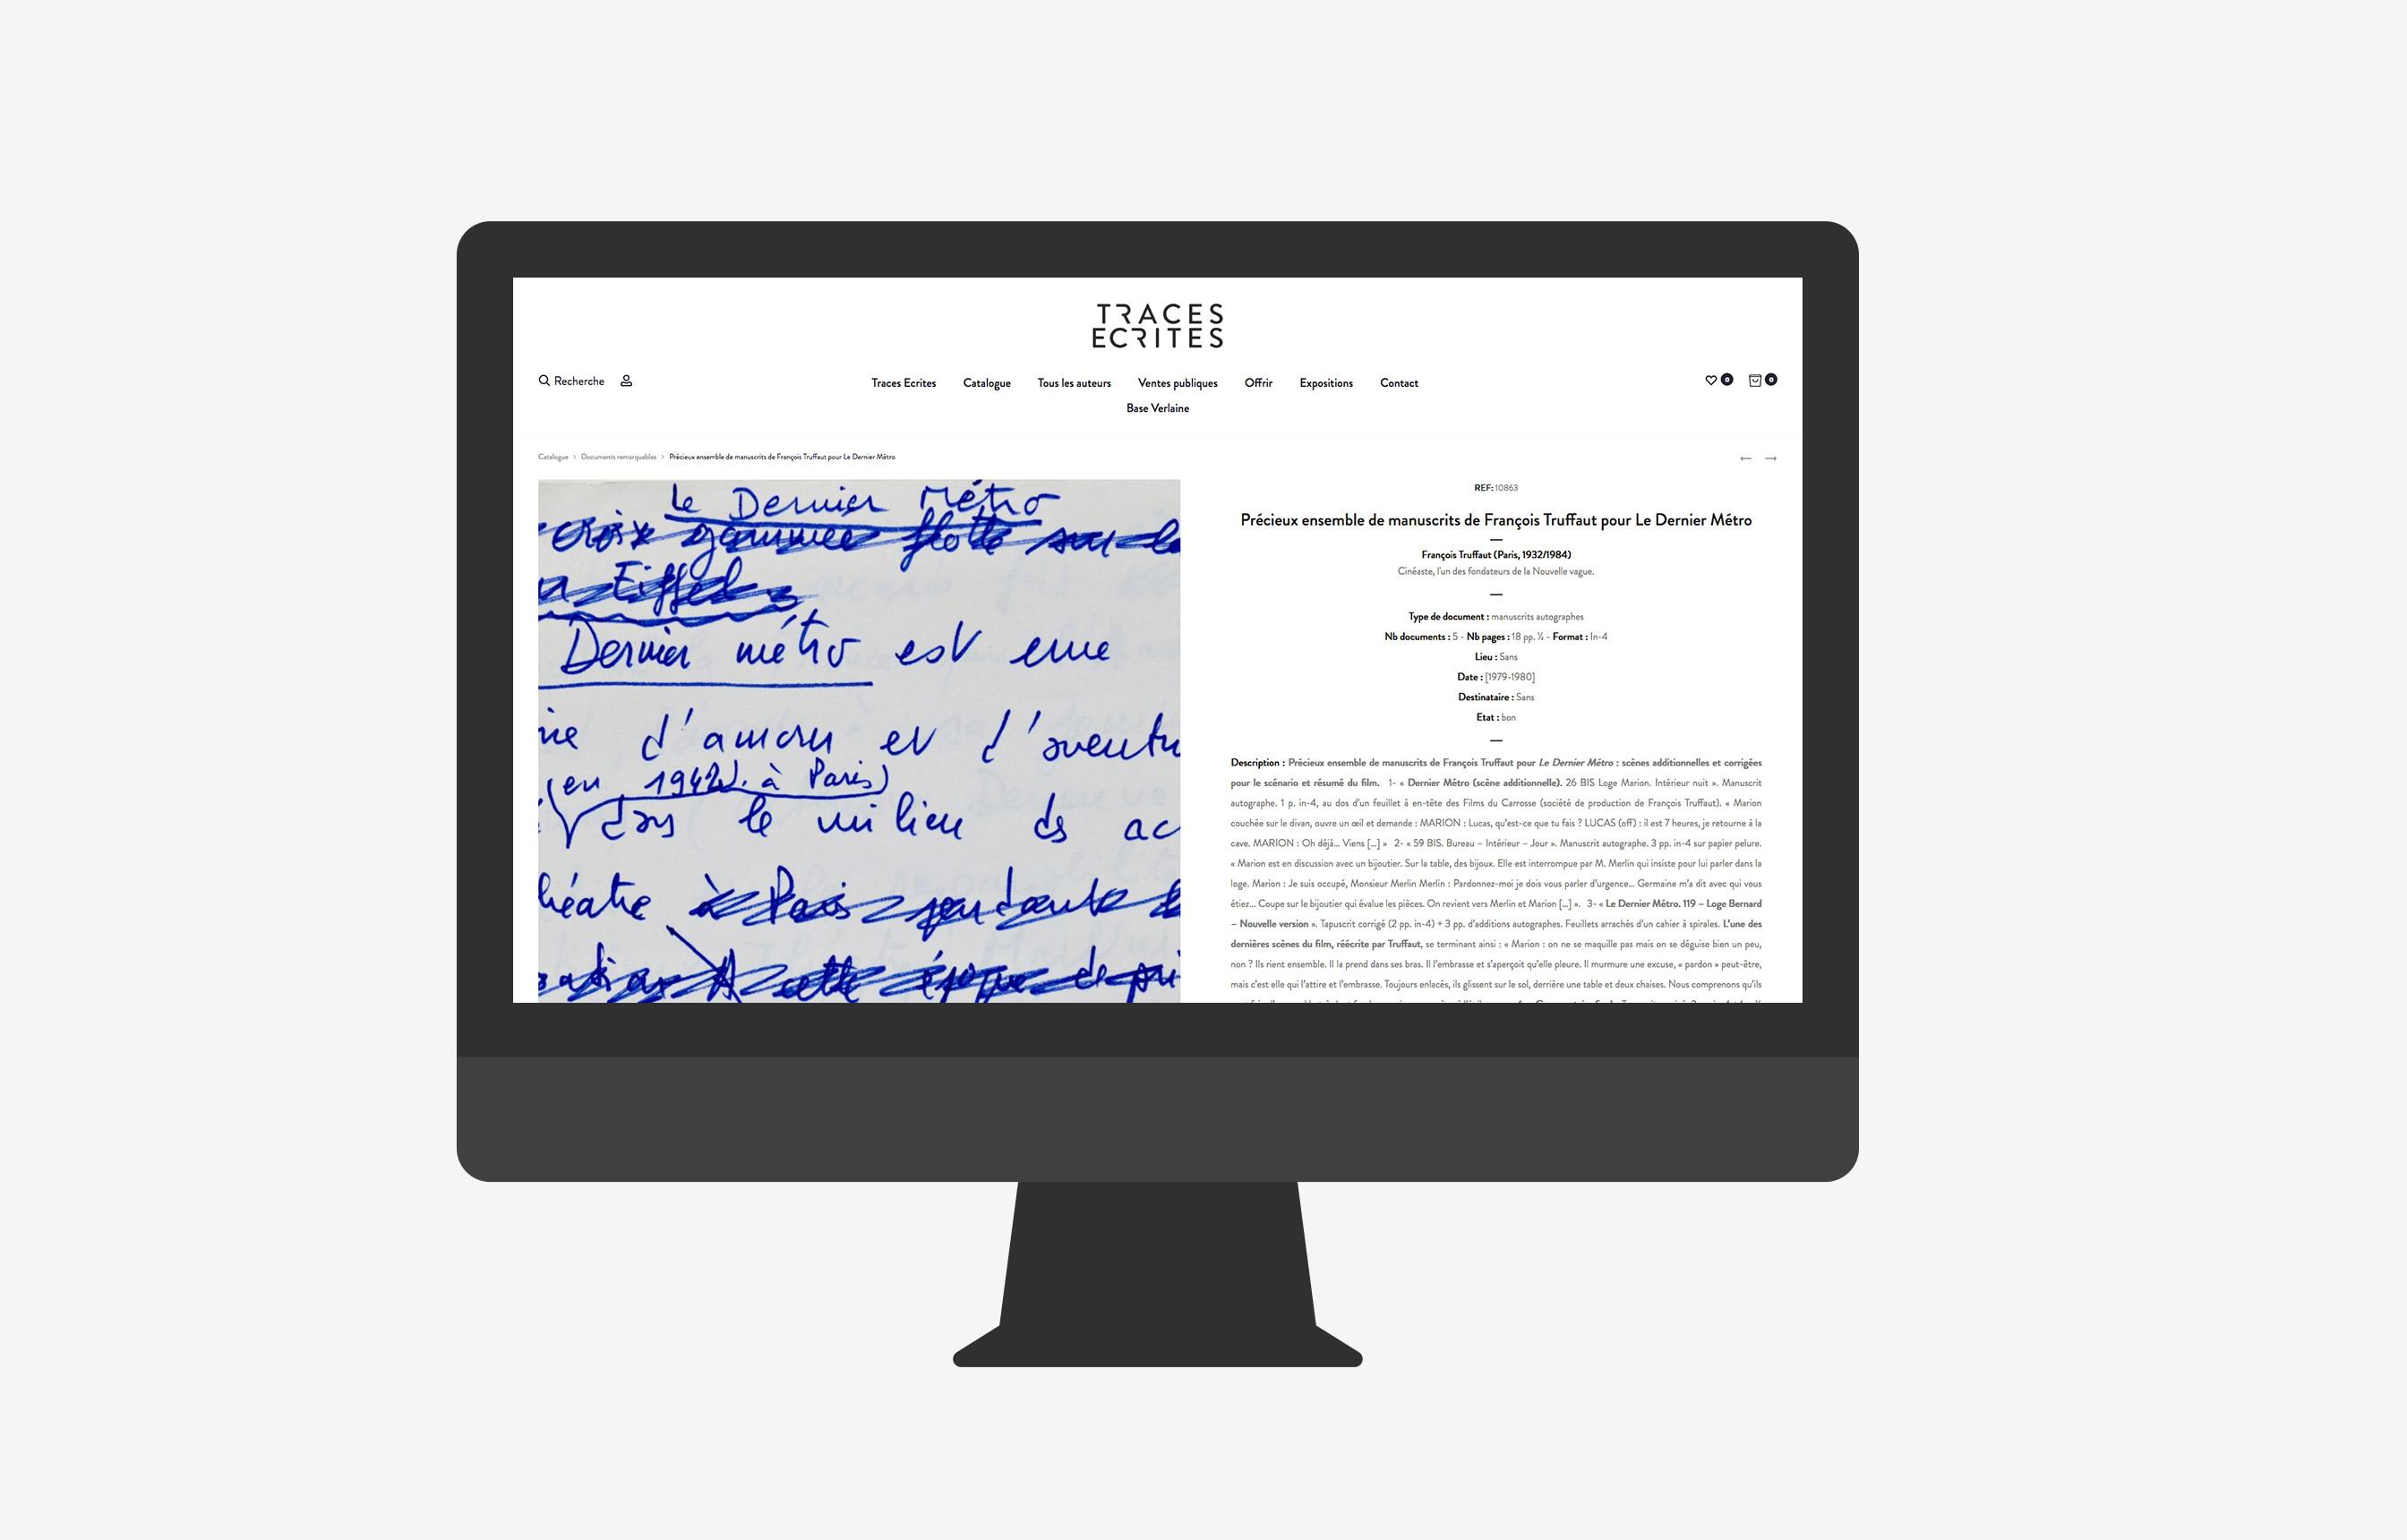 02-traces-ecrites-pikteo-webdesign-graphic-design-freelance-paris-bruxelles-londres